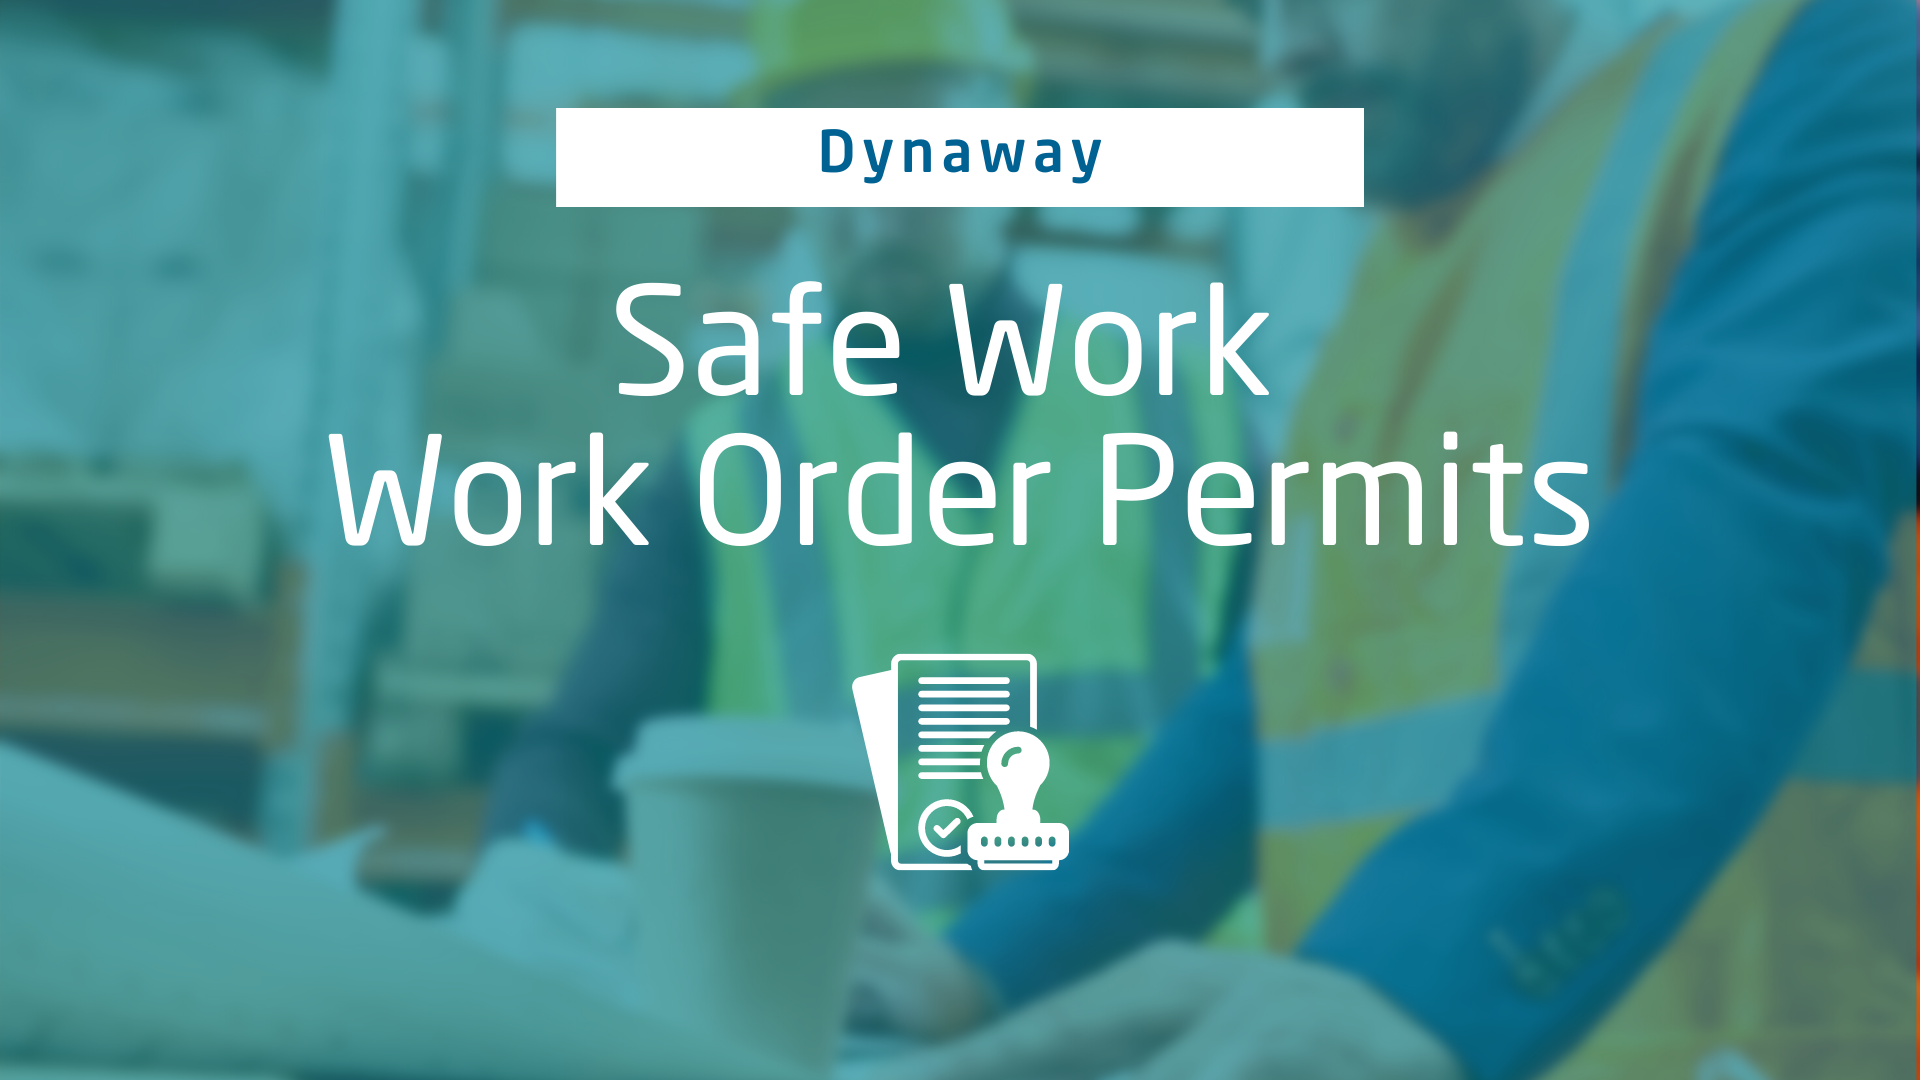 Work Order Permits demo